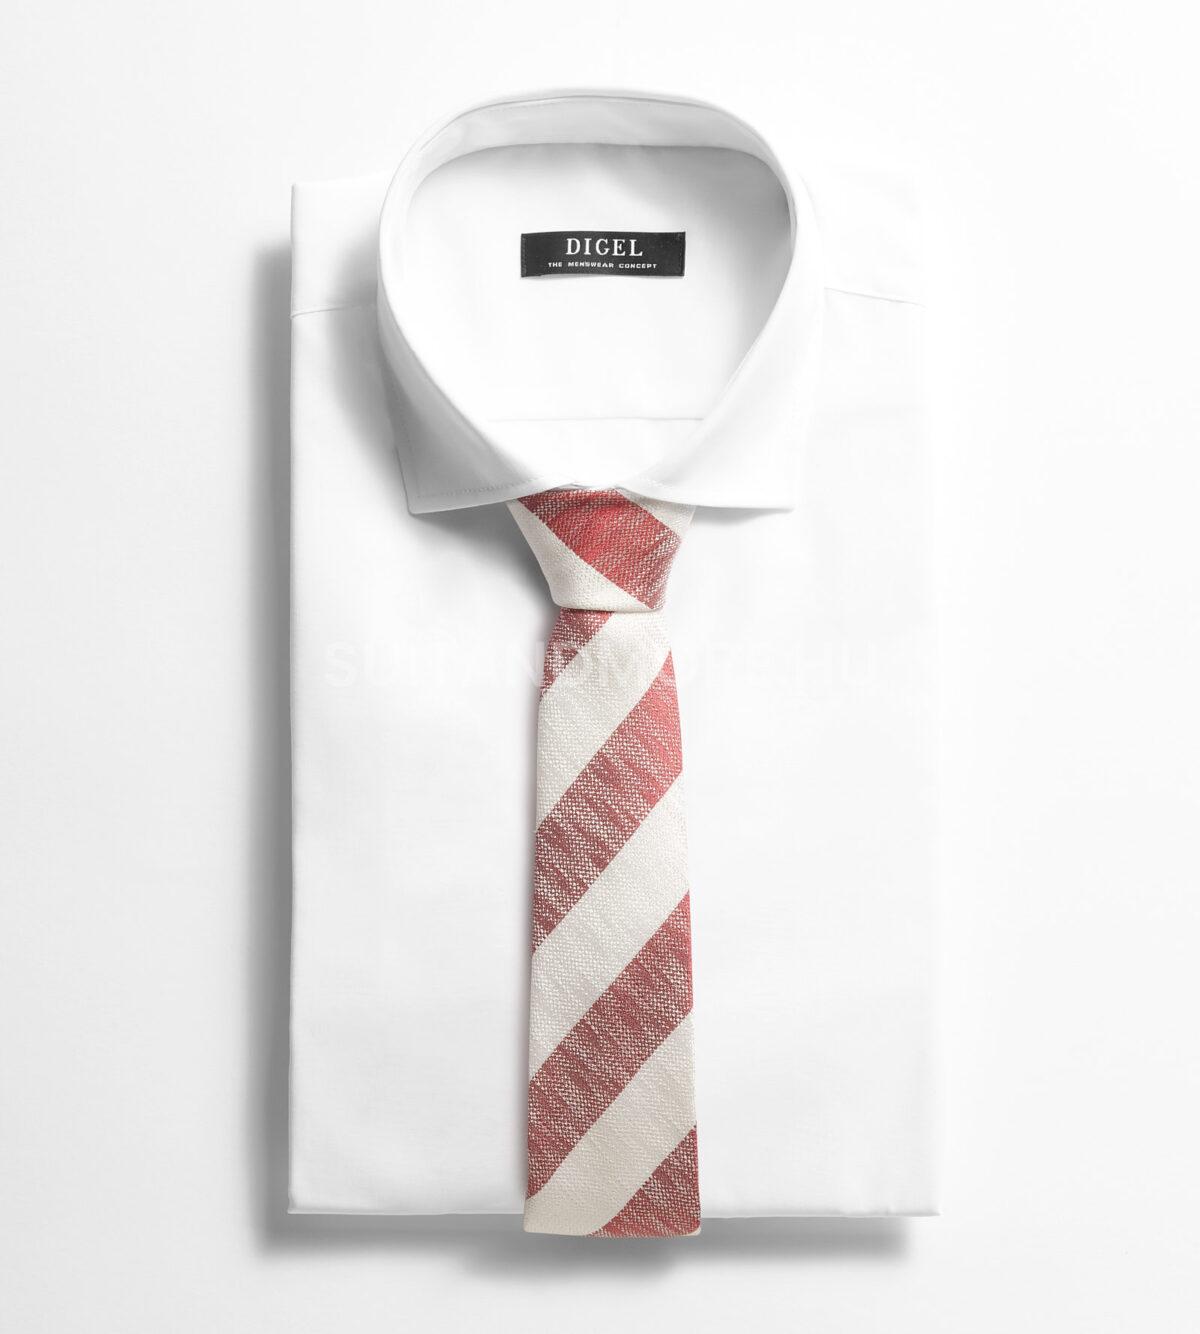 digel-piros-csikos-selyem-nyakkendo-dunhill-1179012-65-02